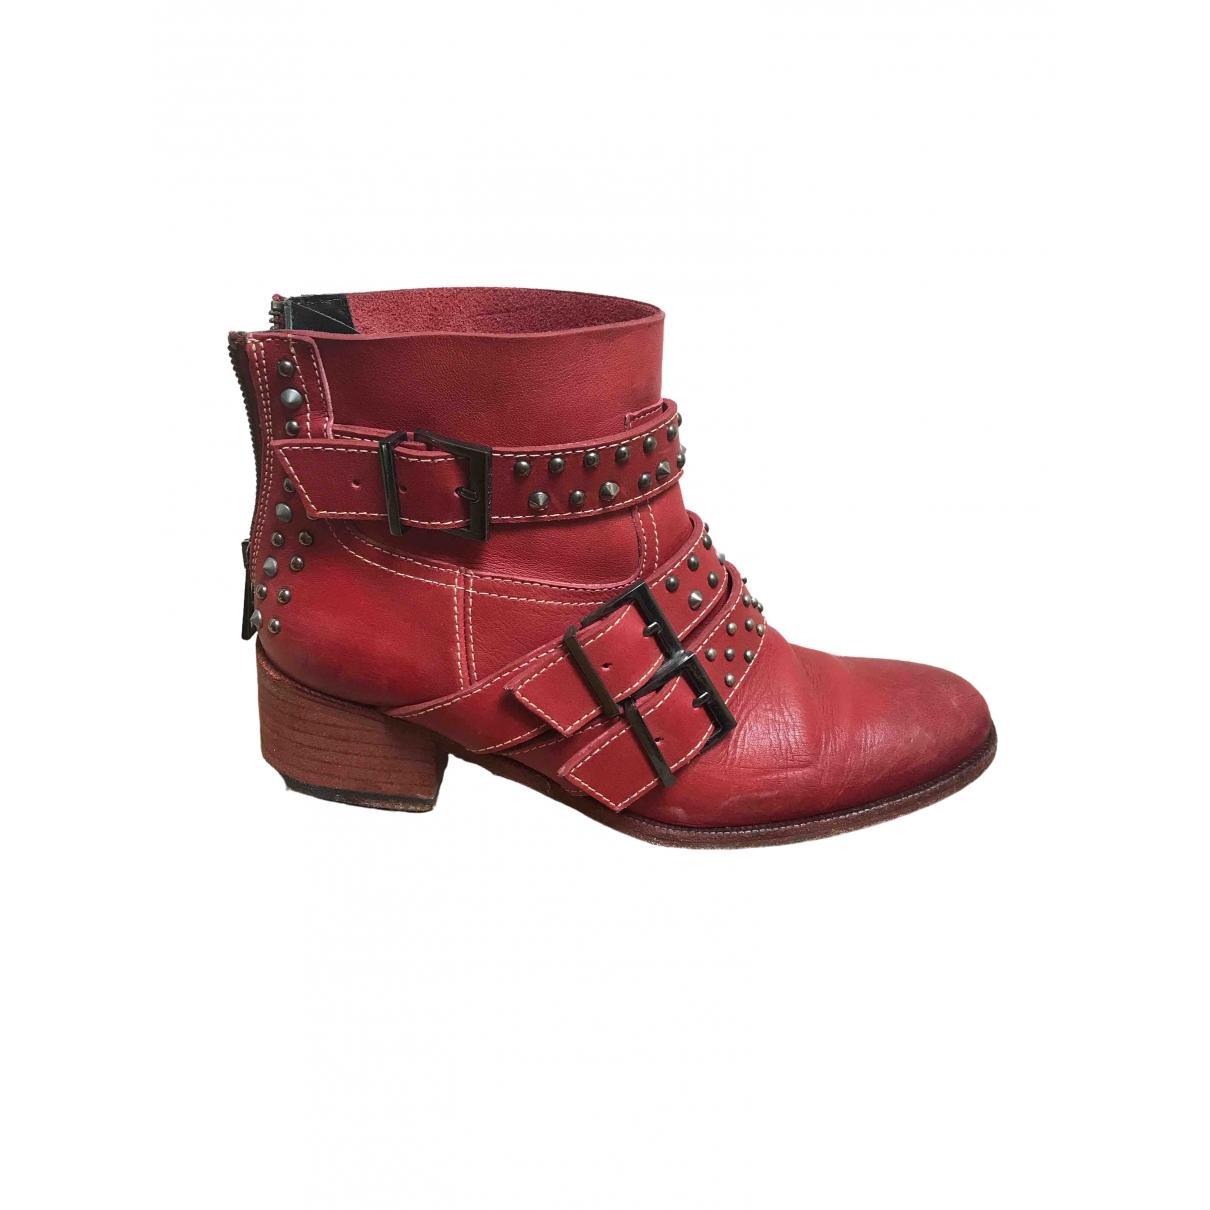 Zadig & Voltaire \N Stiefel in  Rot Leder